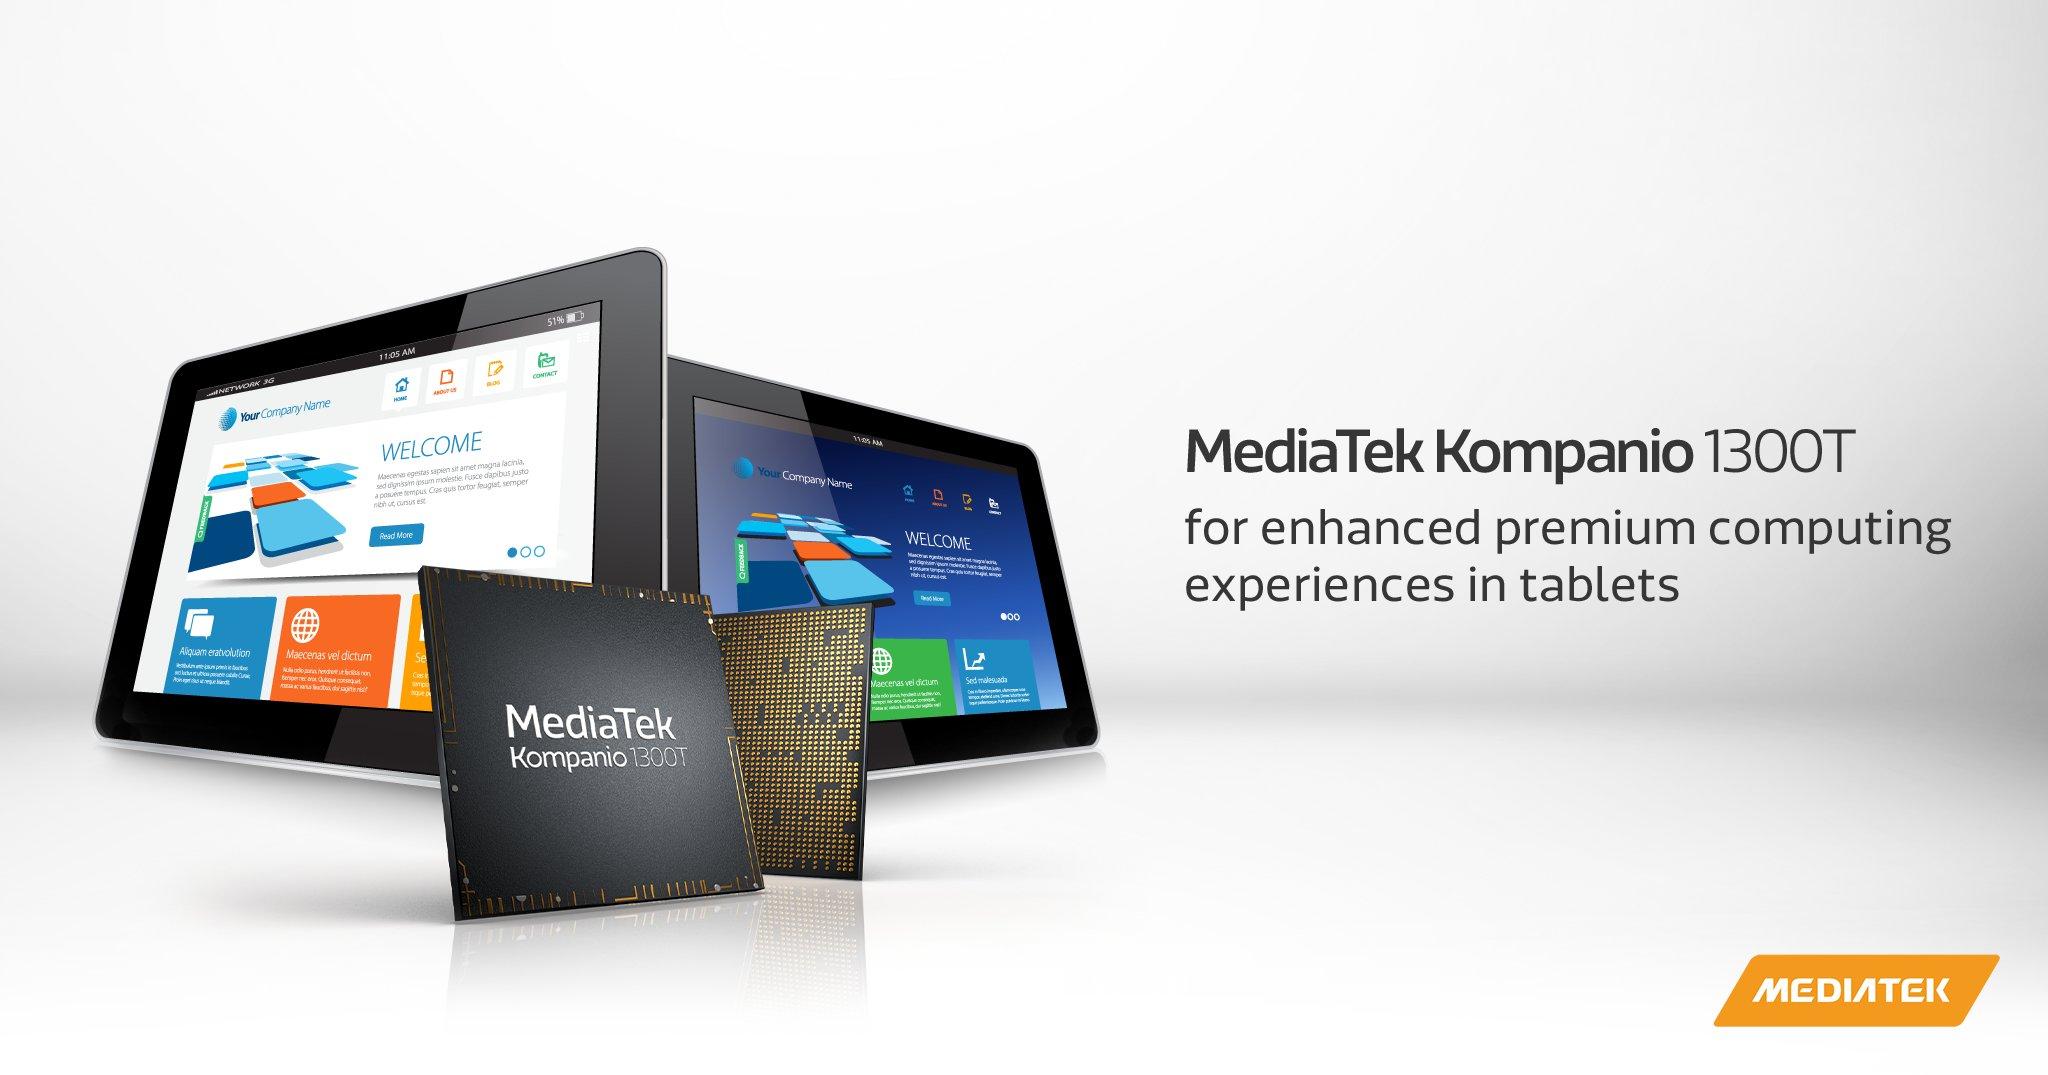 MediaTek Kompanio 1300T designed & developed to bring 5G support to Tablets & Chromebooks